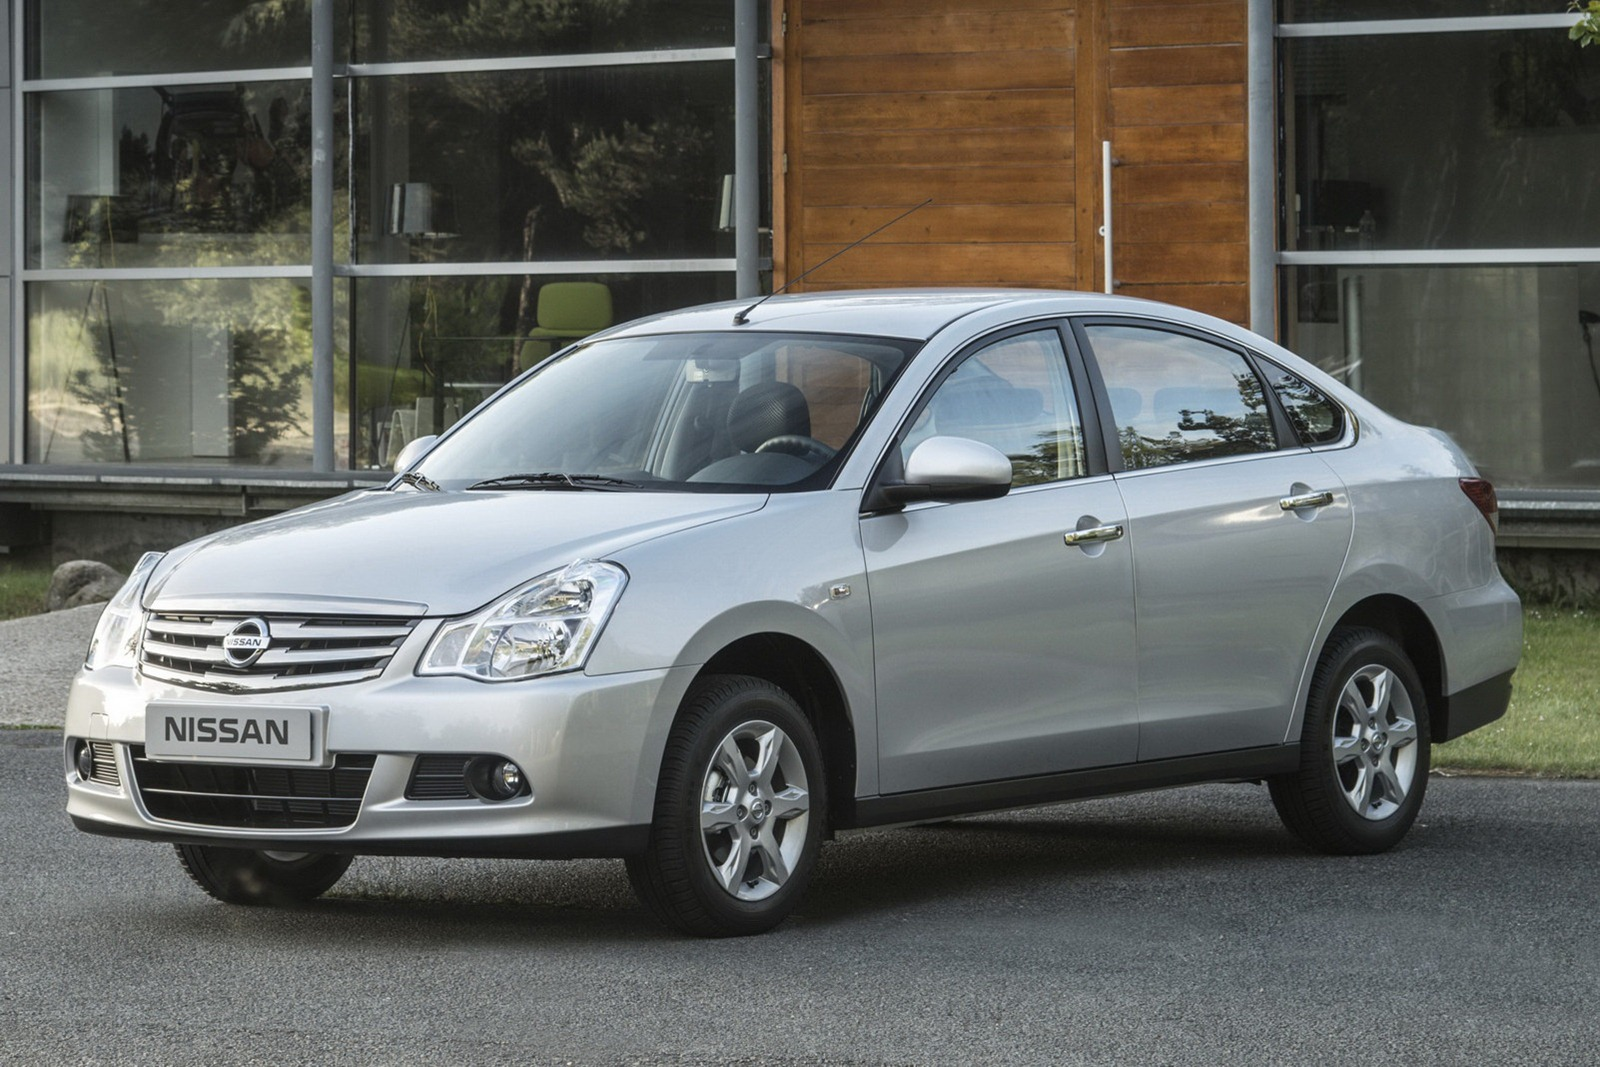 Ниссан соктября свернет производство седана Almera на«АвтоВАЗе»